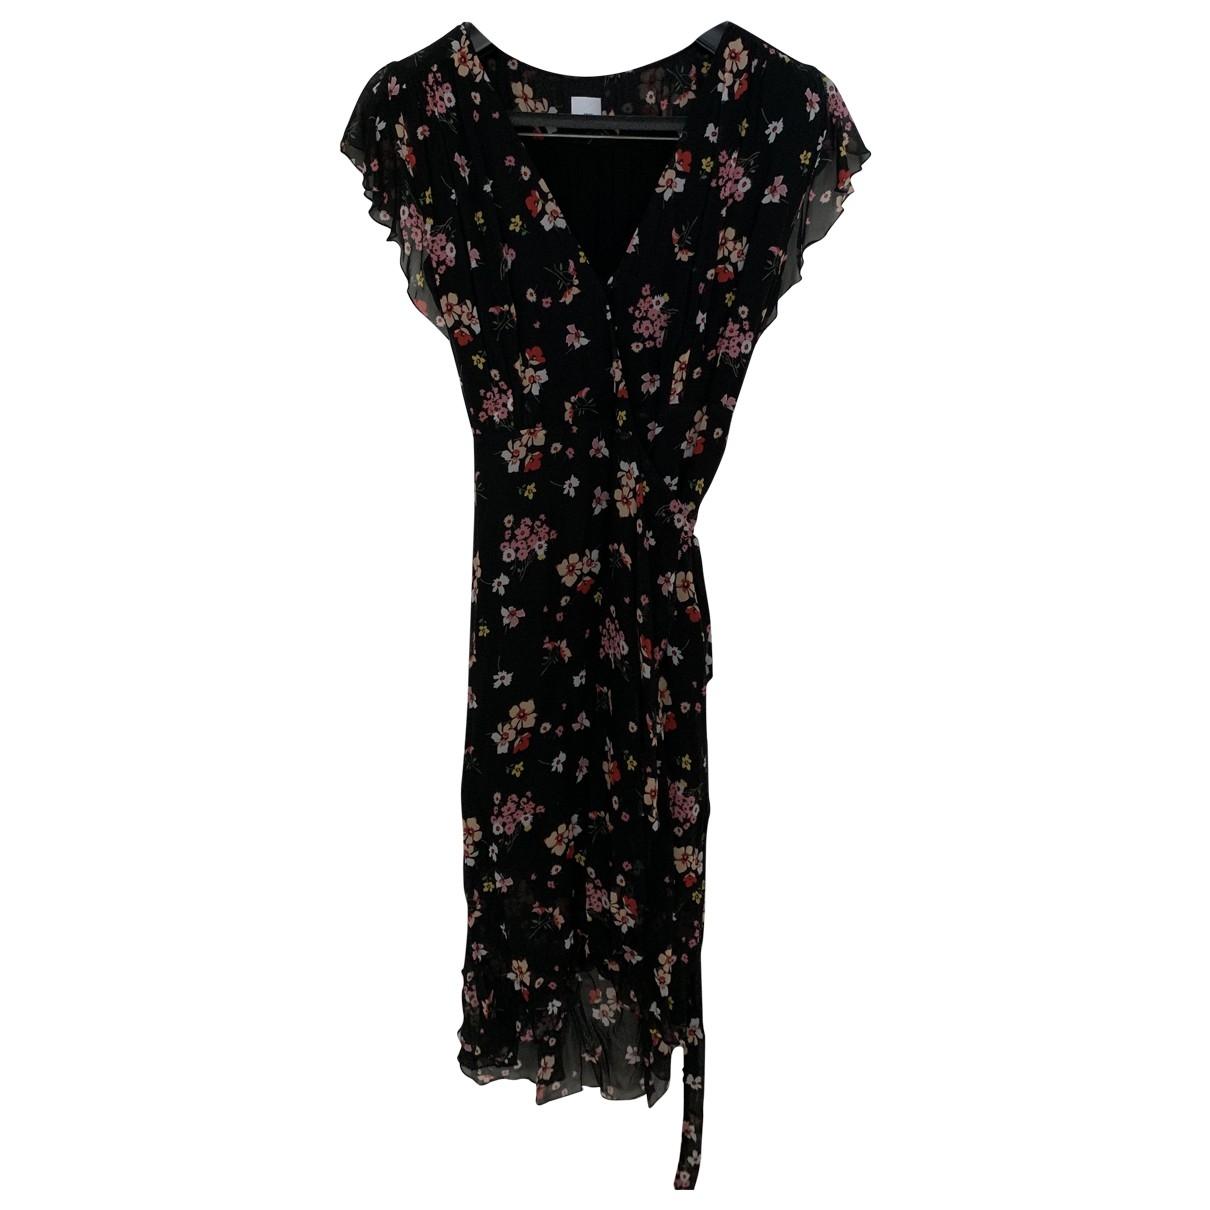 Iris & Ink \N Black dress for Women 8 UK